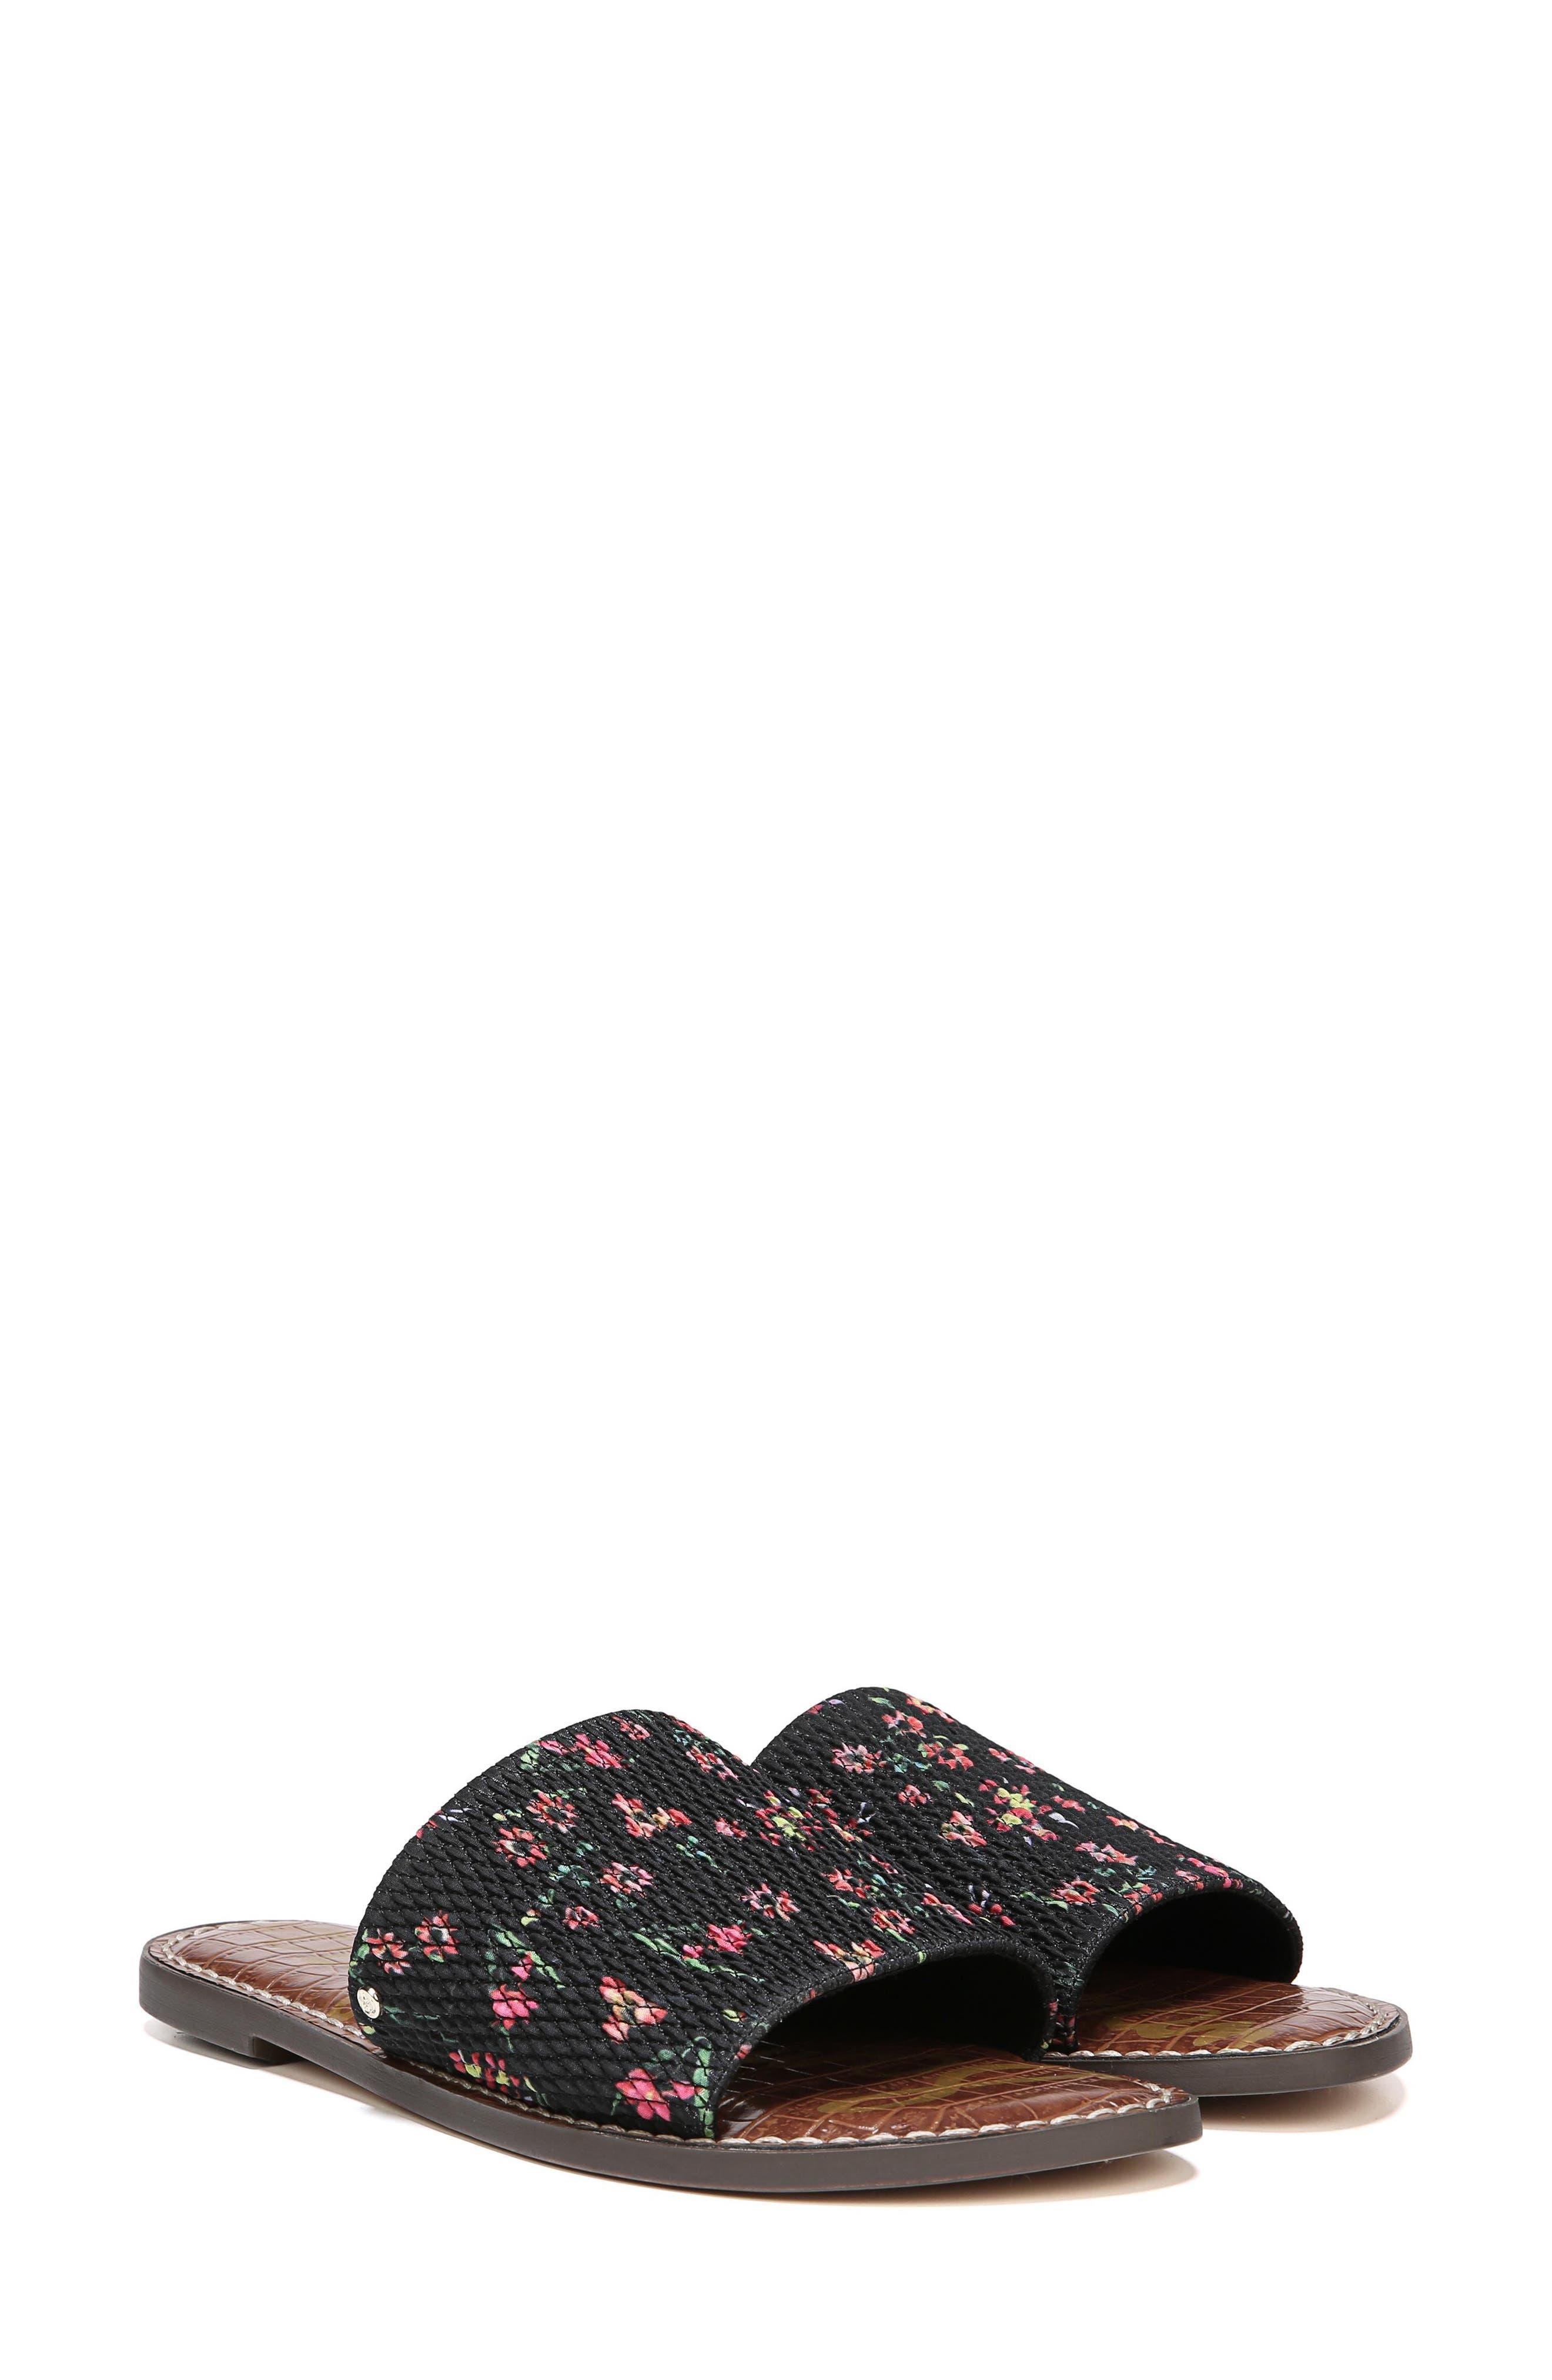 Gio Slide Sandal,                             Alternate thumbnail 7, color,                             BLACK FLORAL PRINT FABRIC